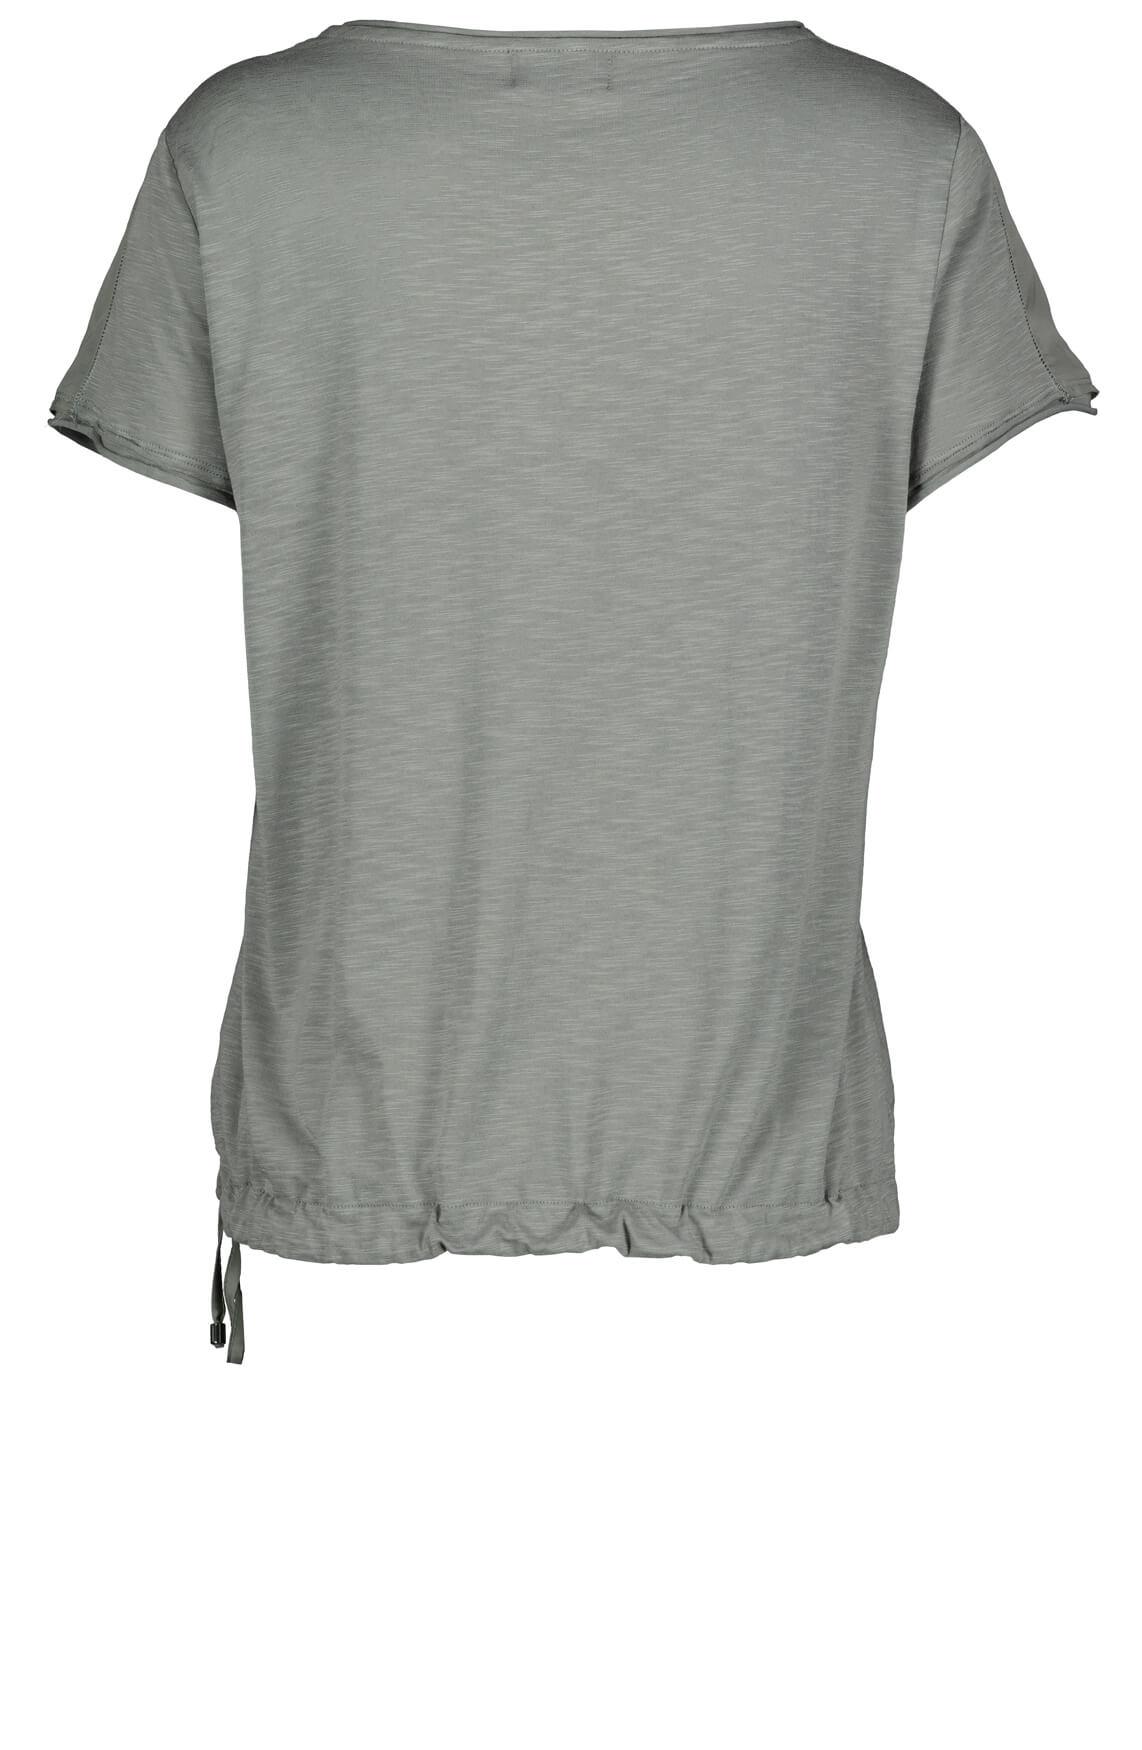 Monari Dames Materiaalmix shirt Grijs